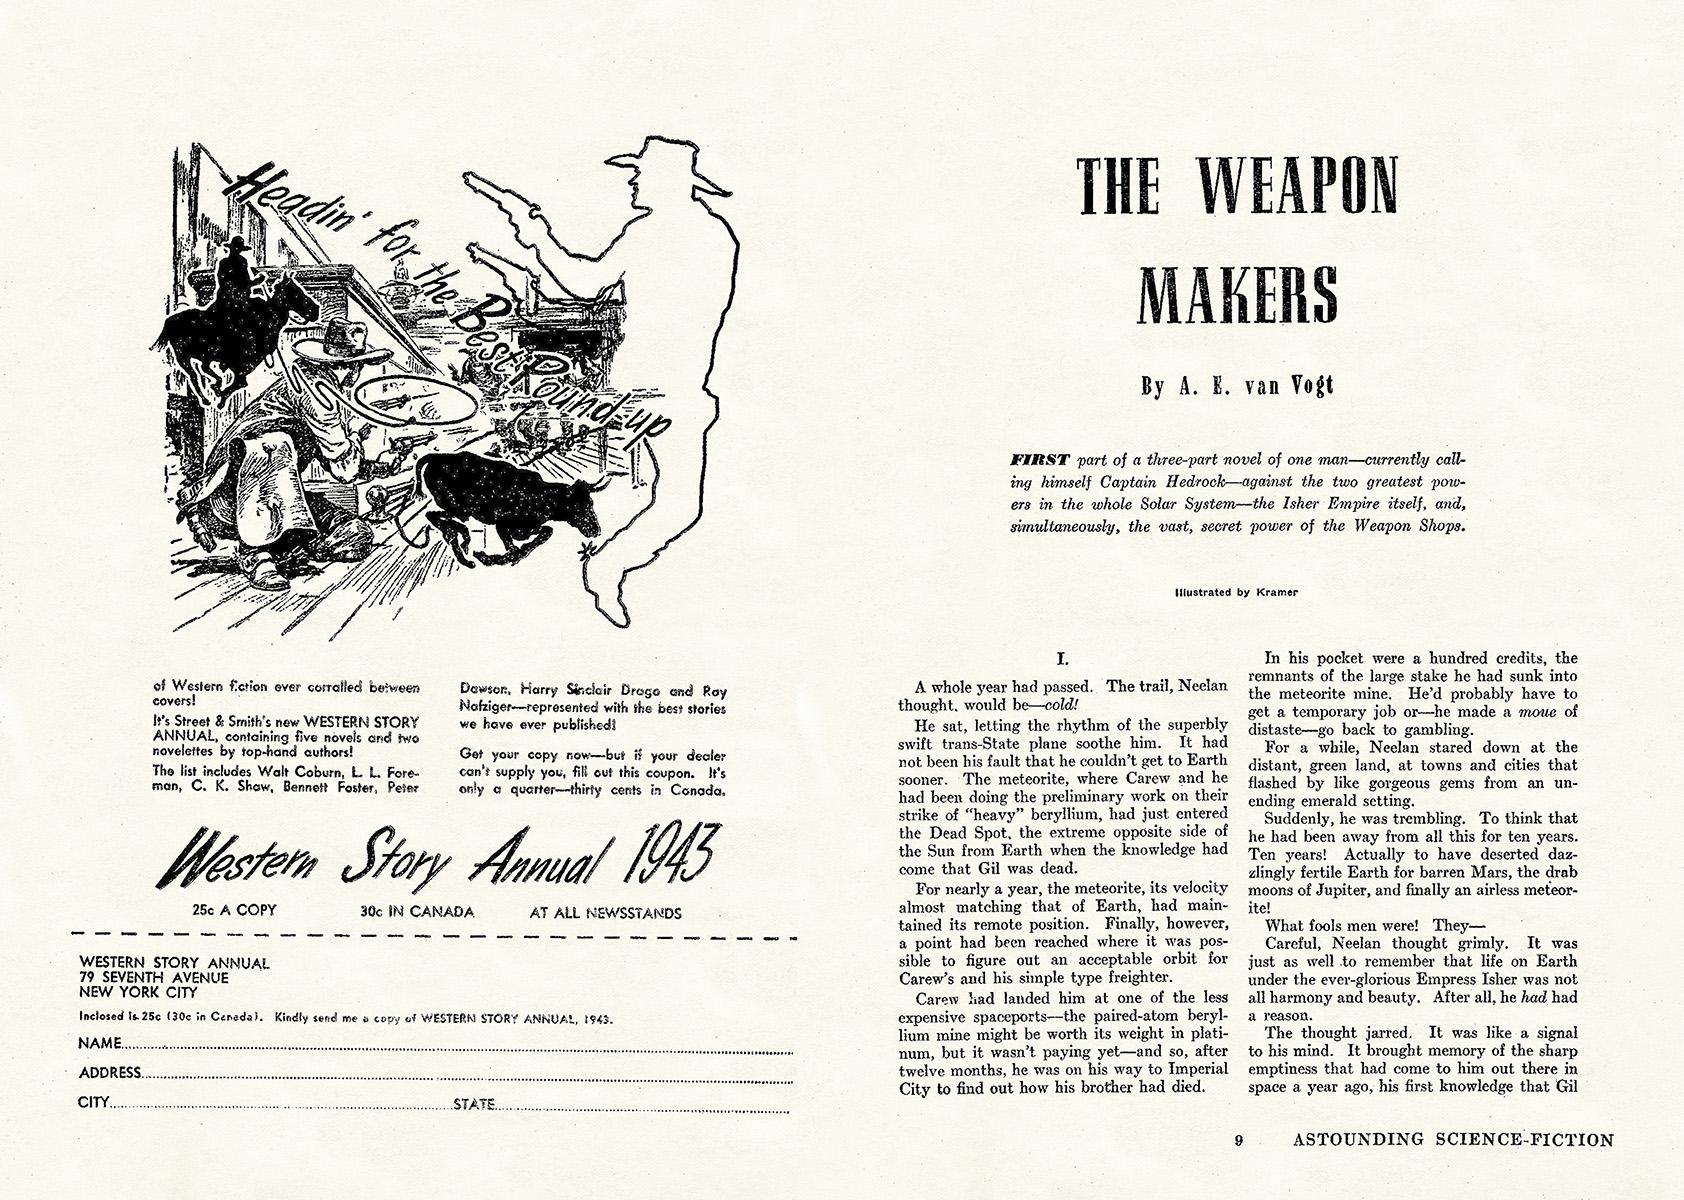 Astounding Science-Fiction v30n06, February 1943 | SF MAGAZINES